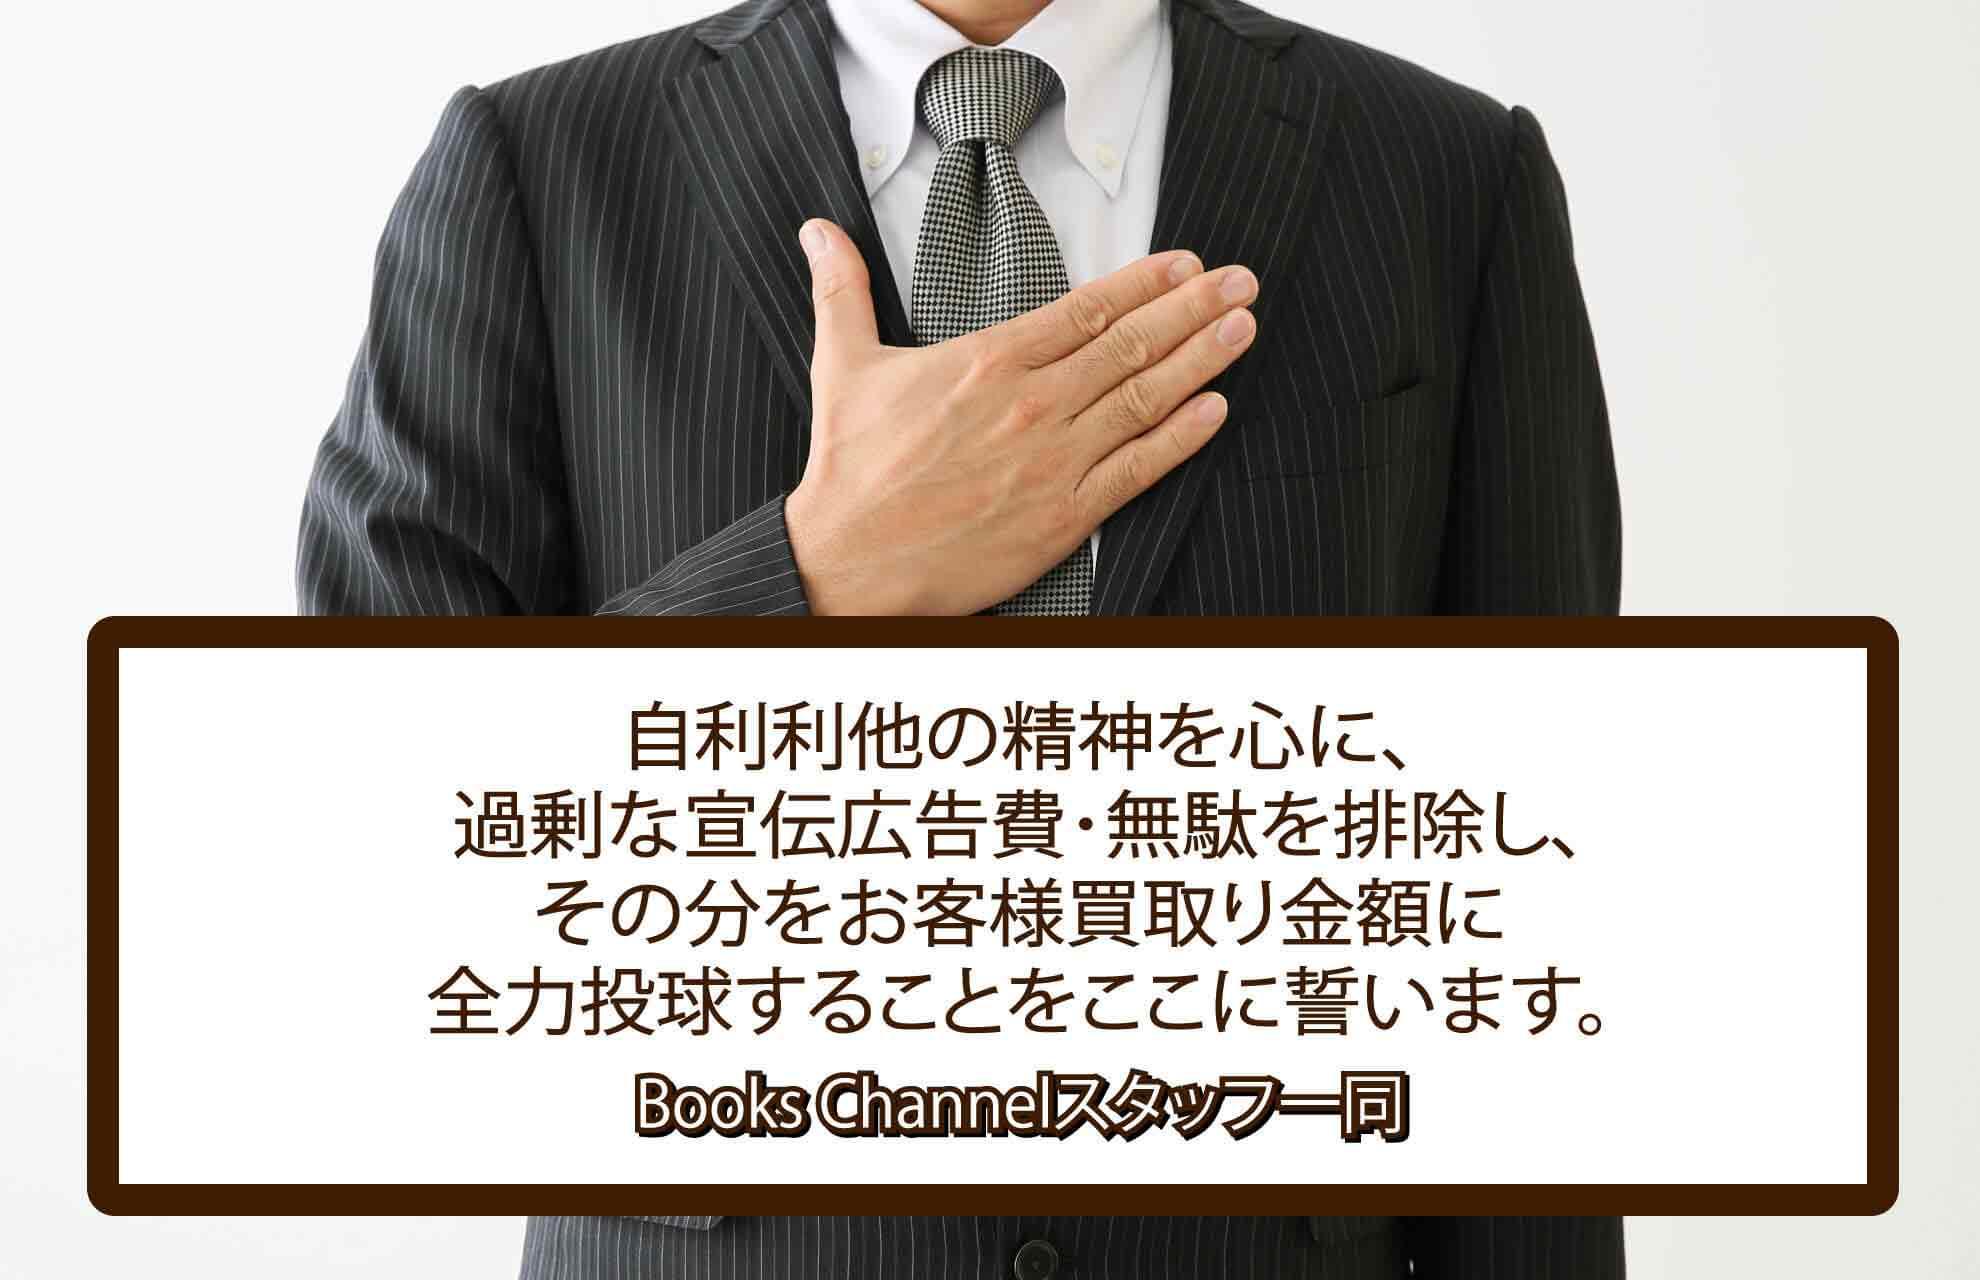 Books Channel宣言 1980 × 1280pic